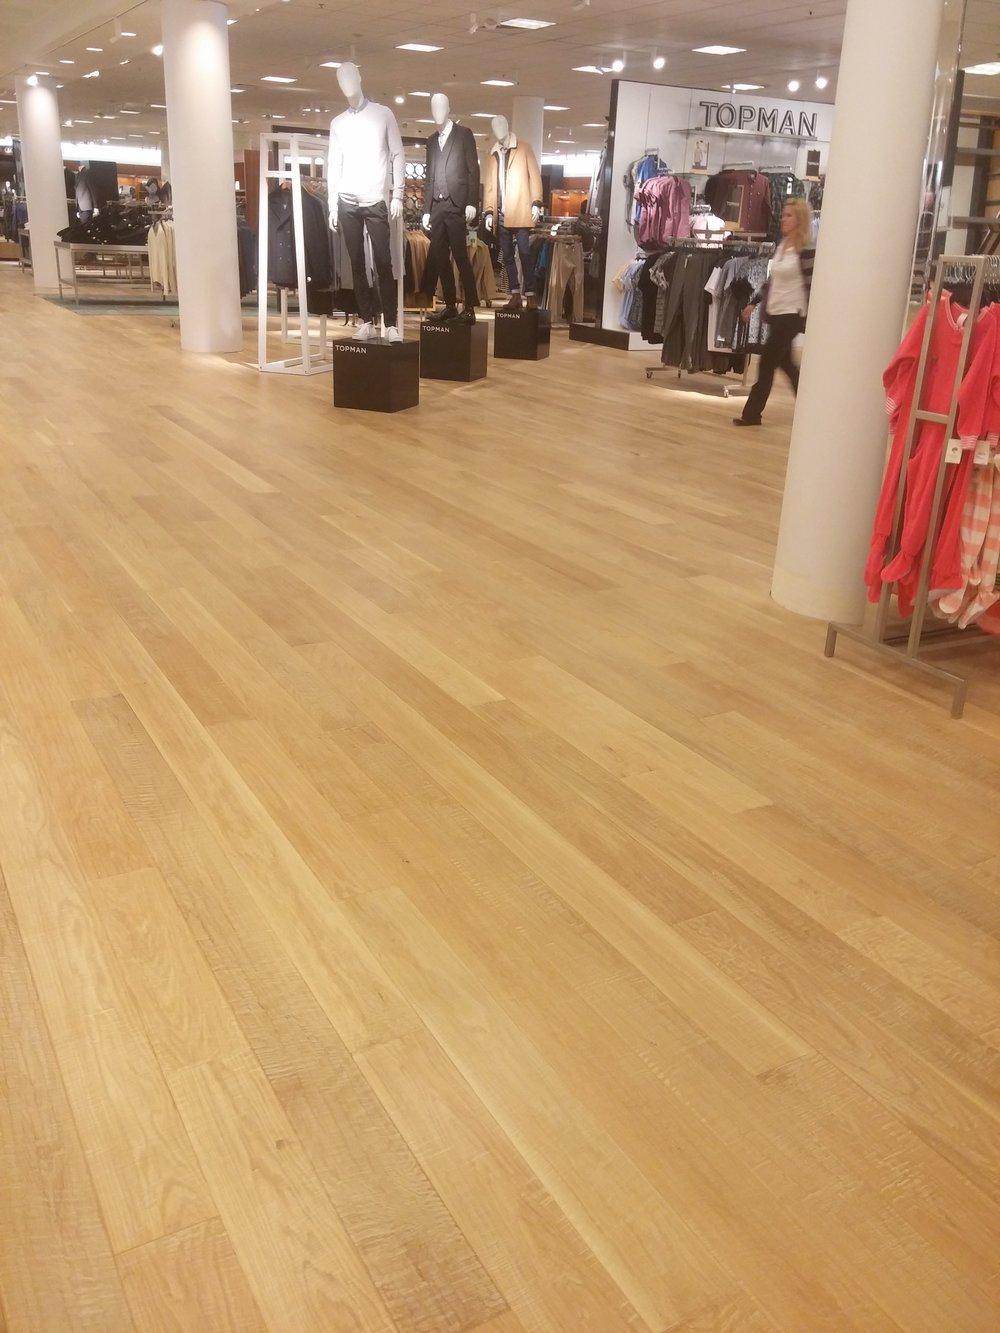 Major Retail-0006.jpg